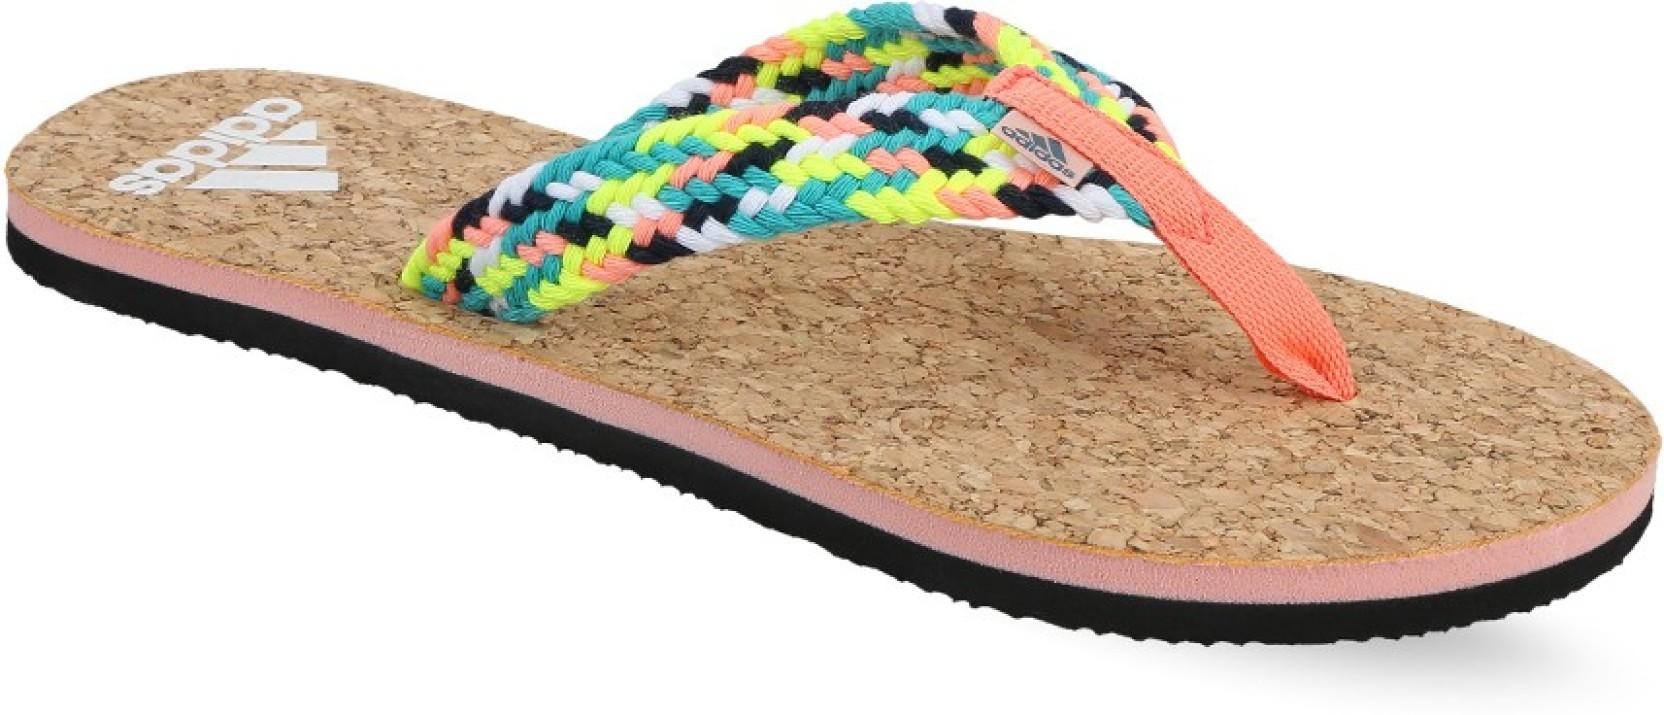 90ff37059cc3 ADIDAS BEACH CORK THONG WS Slippers. Home · Footwear · Women s Footwear ·  Slippers   Flip Flops